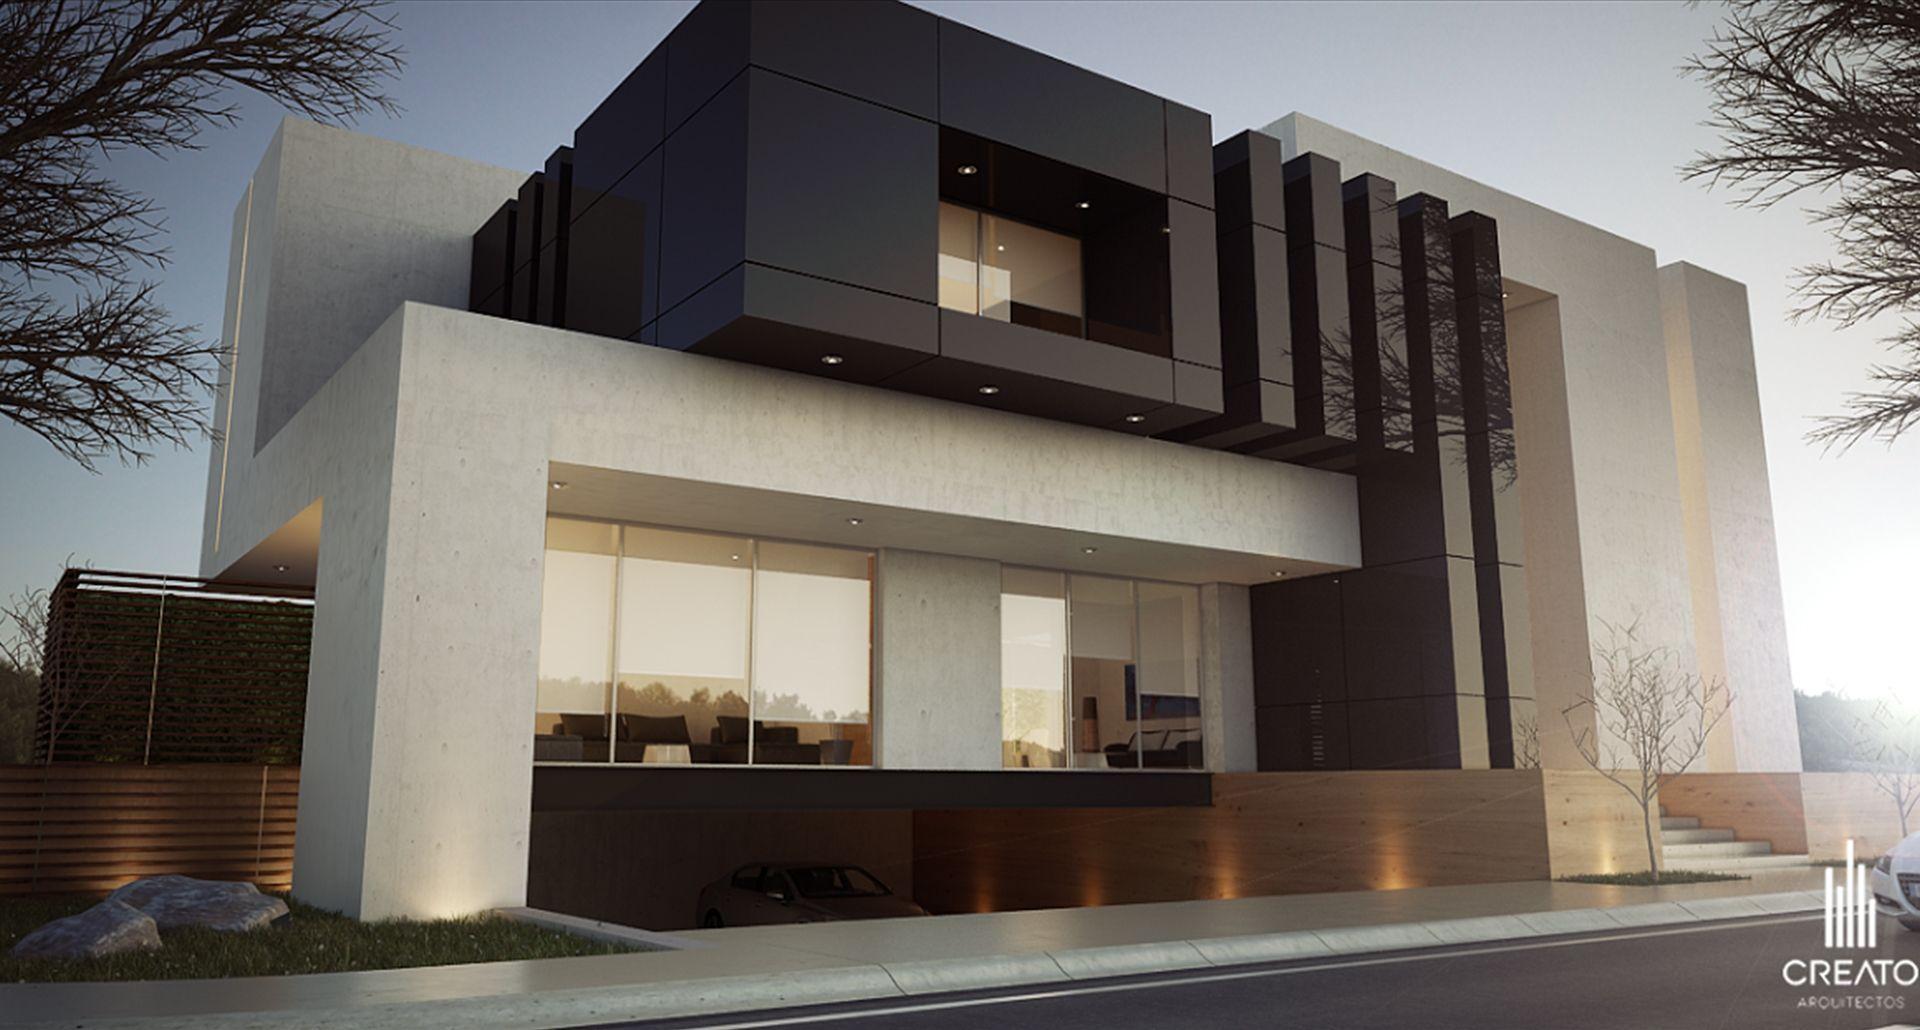 Provenza guadalajara mex creato arquitectos arch - Casas arquitectura moderna ...